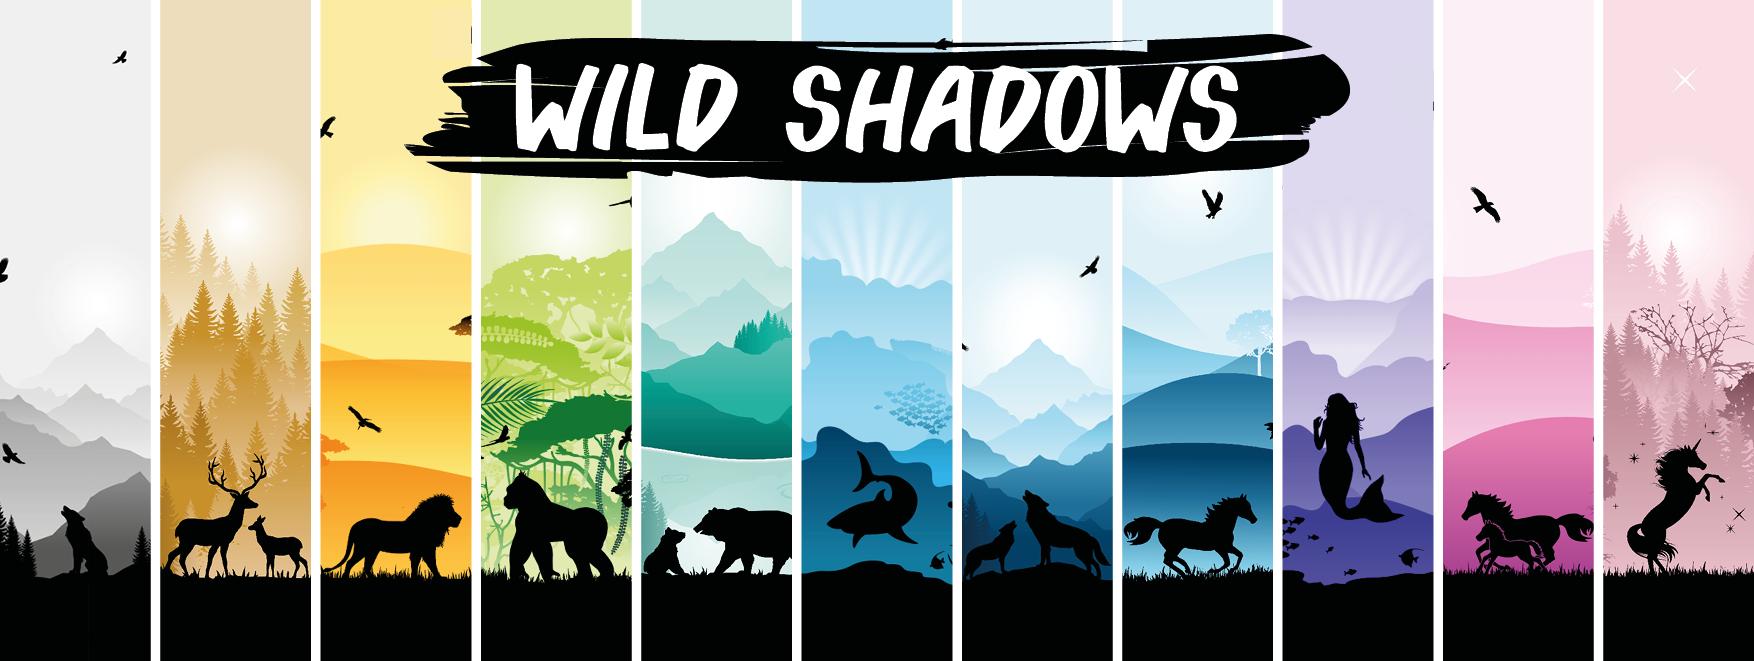 Wild Shadows